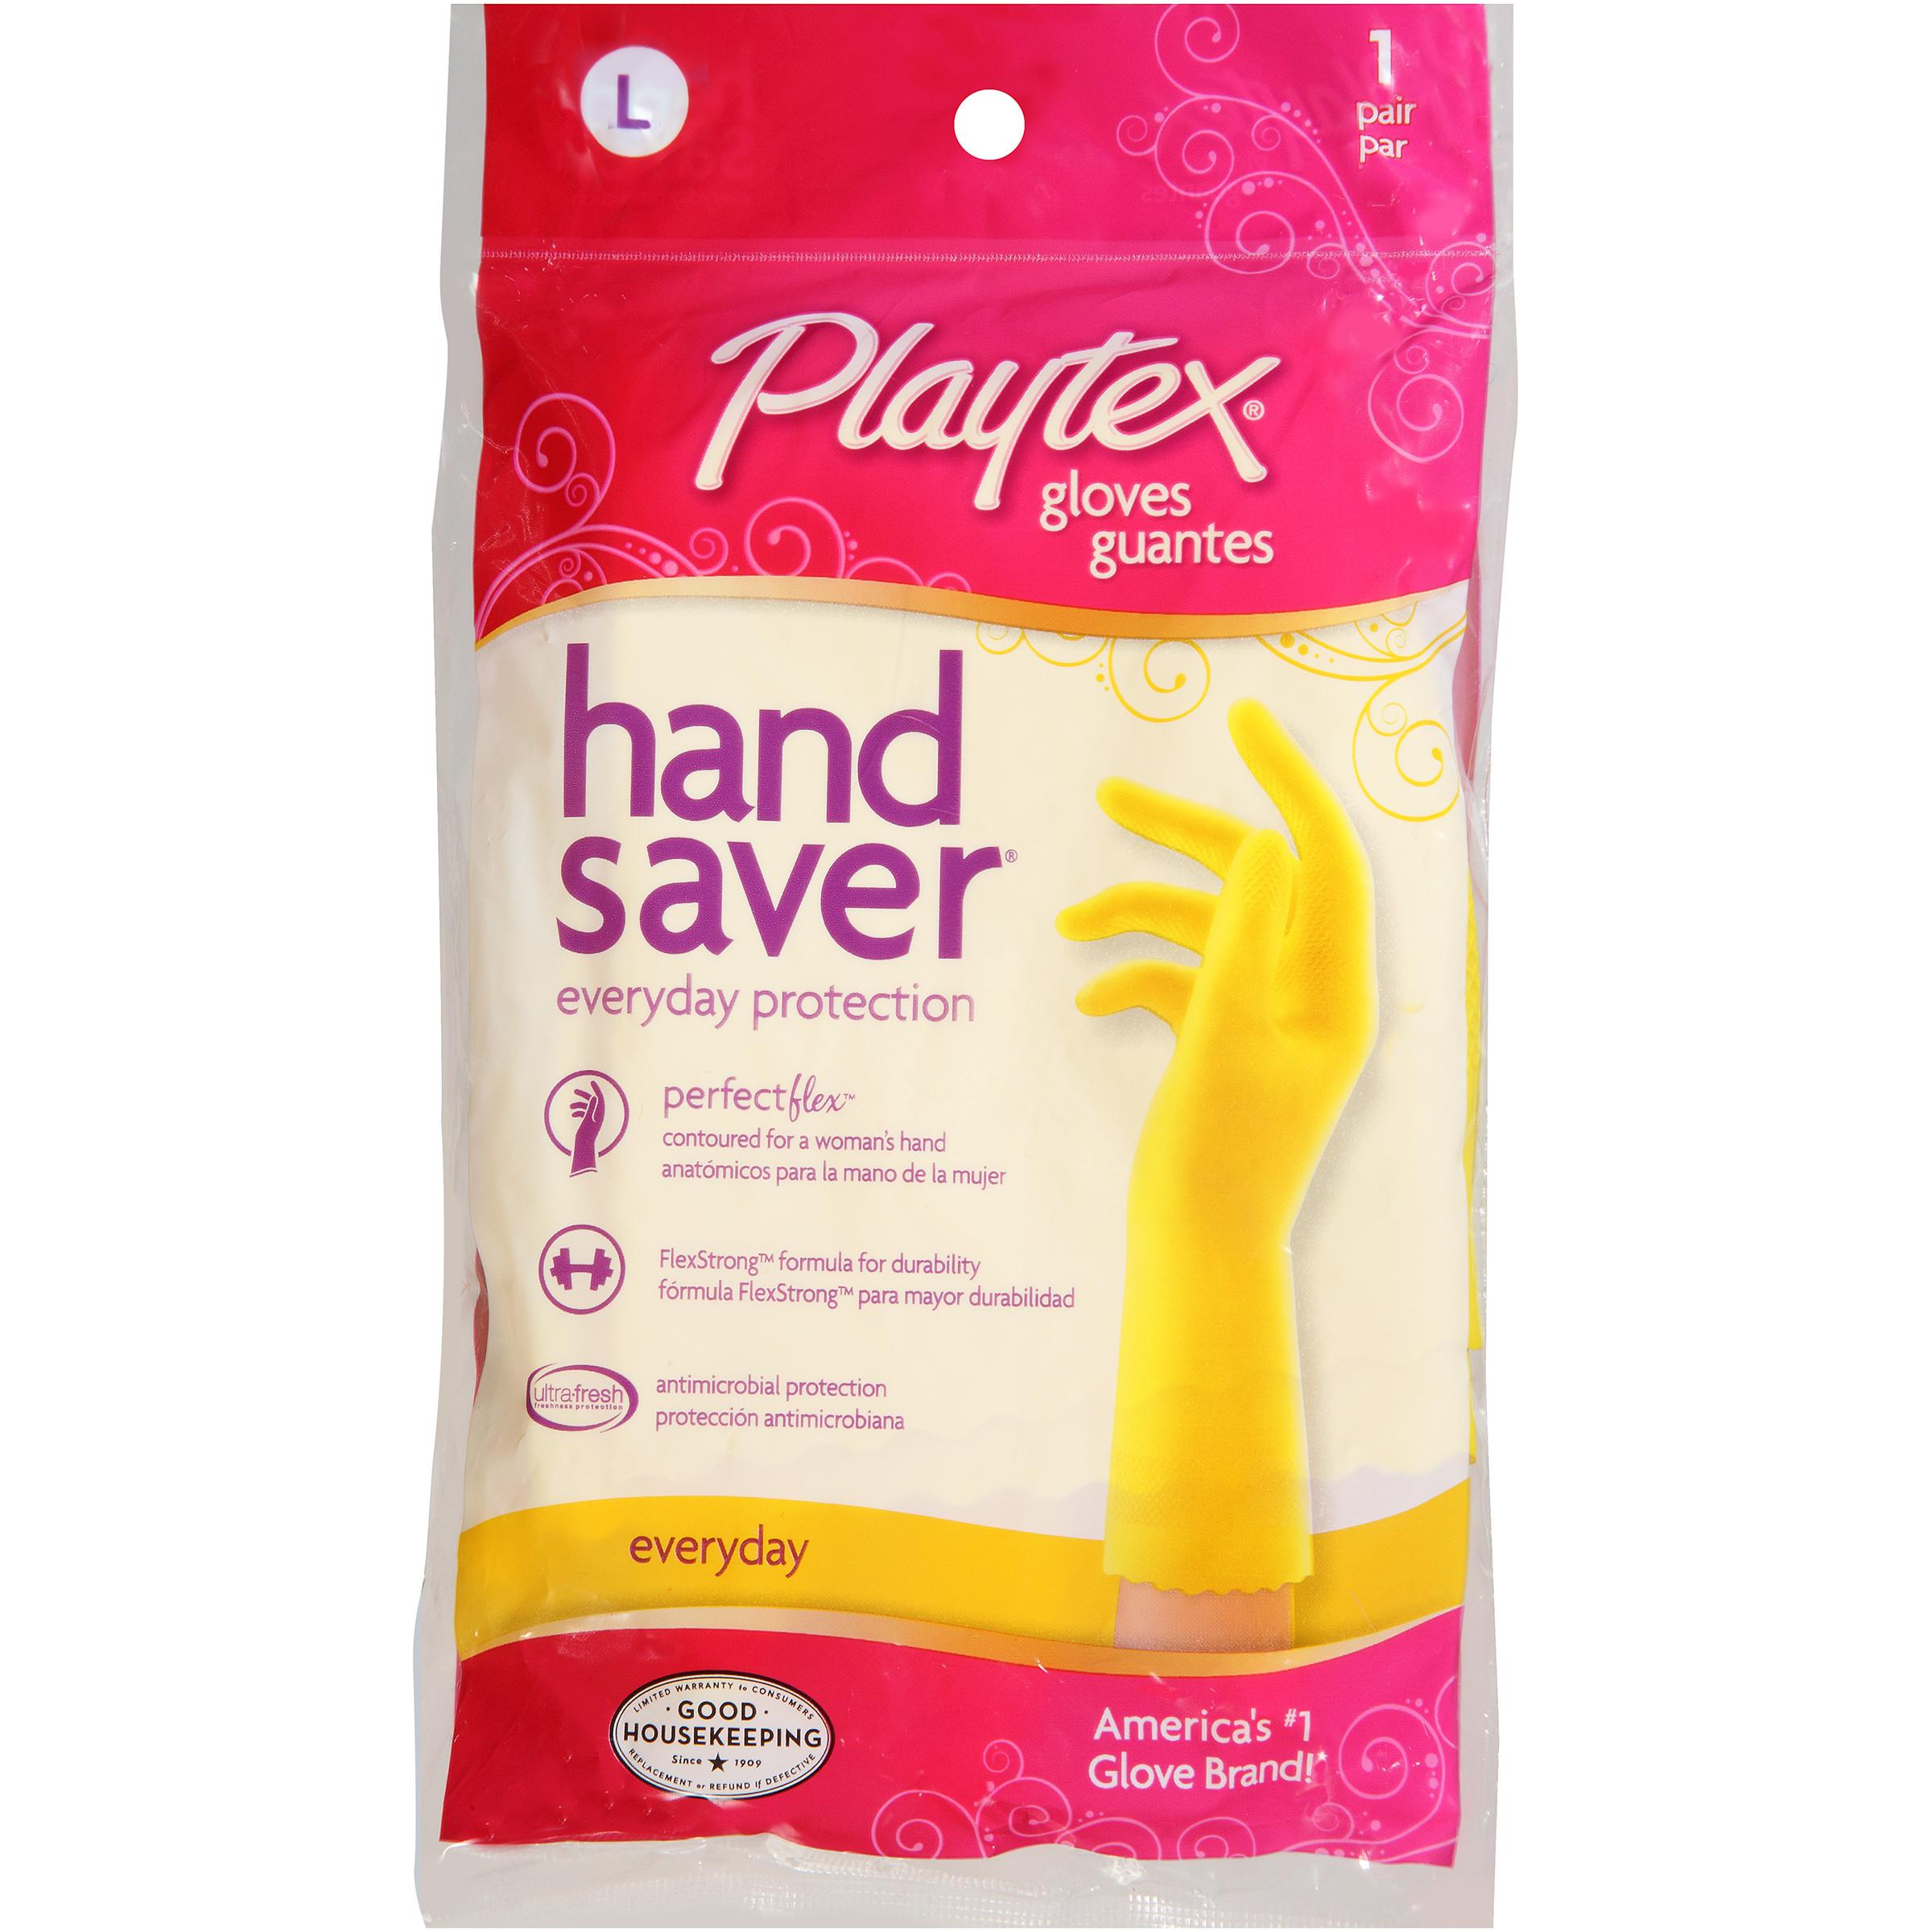 Playtex Handsaver Reusable Gloves Large - 1 Pair